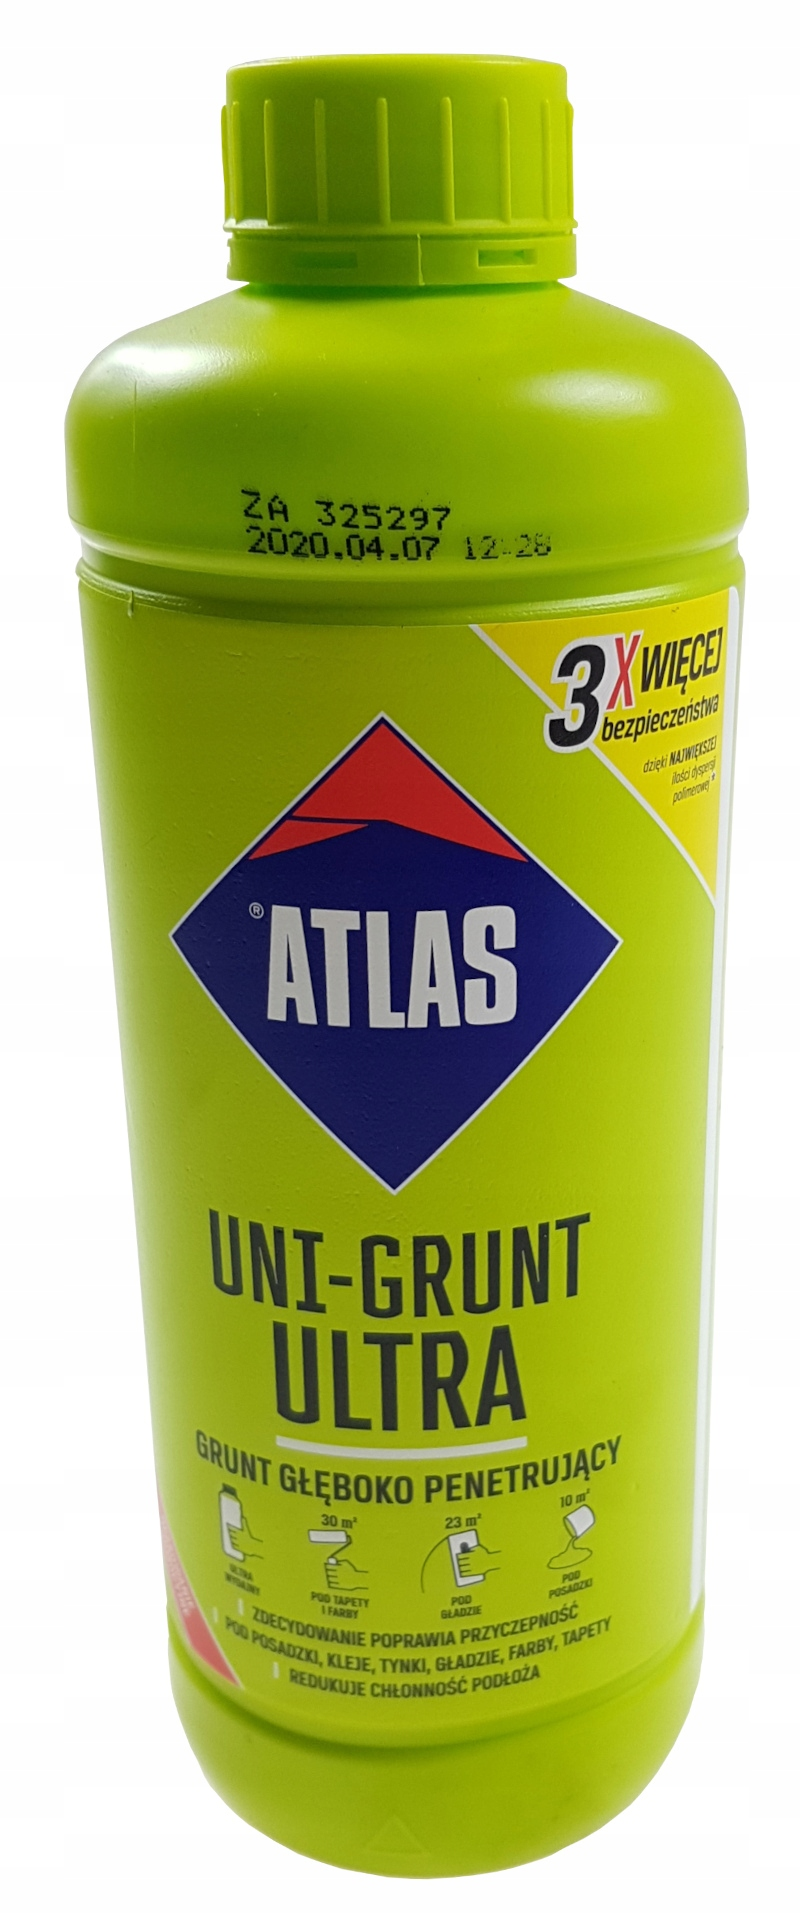 Atlas uni-grunt ULTRA penetrujący uniwersalny 1kg